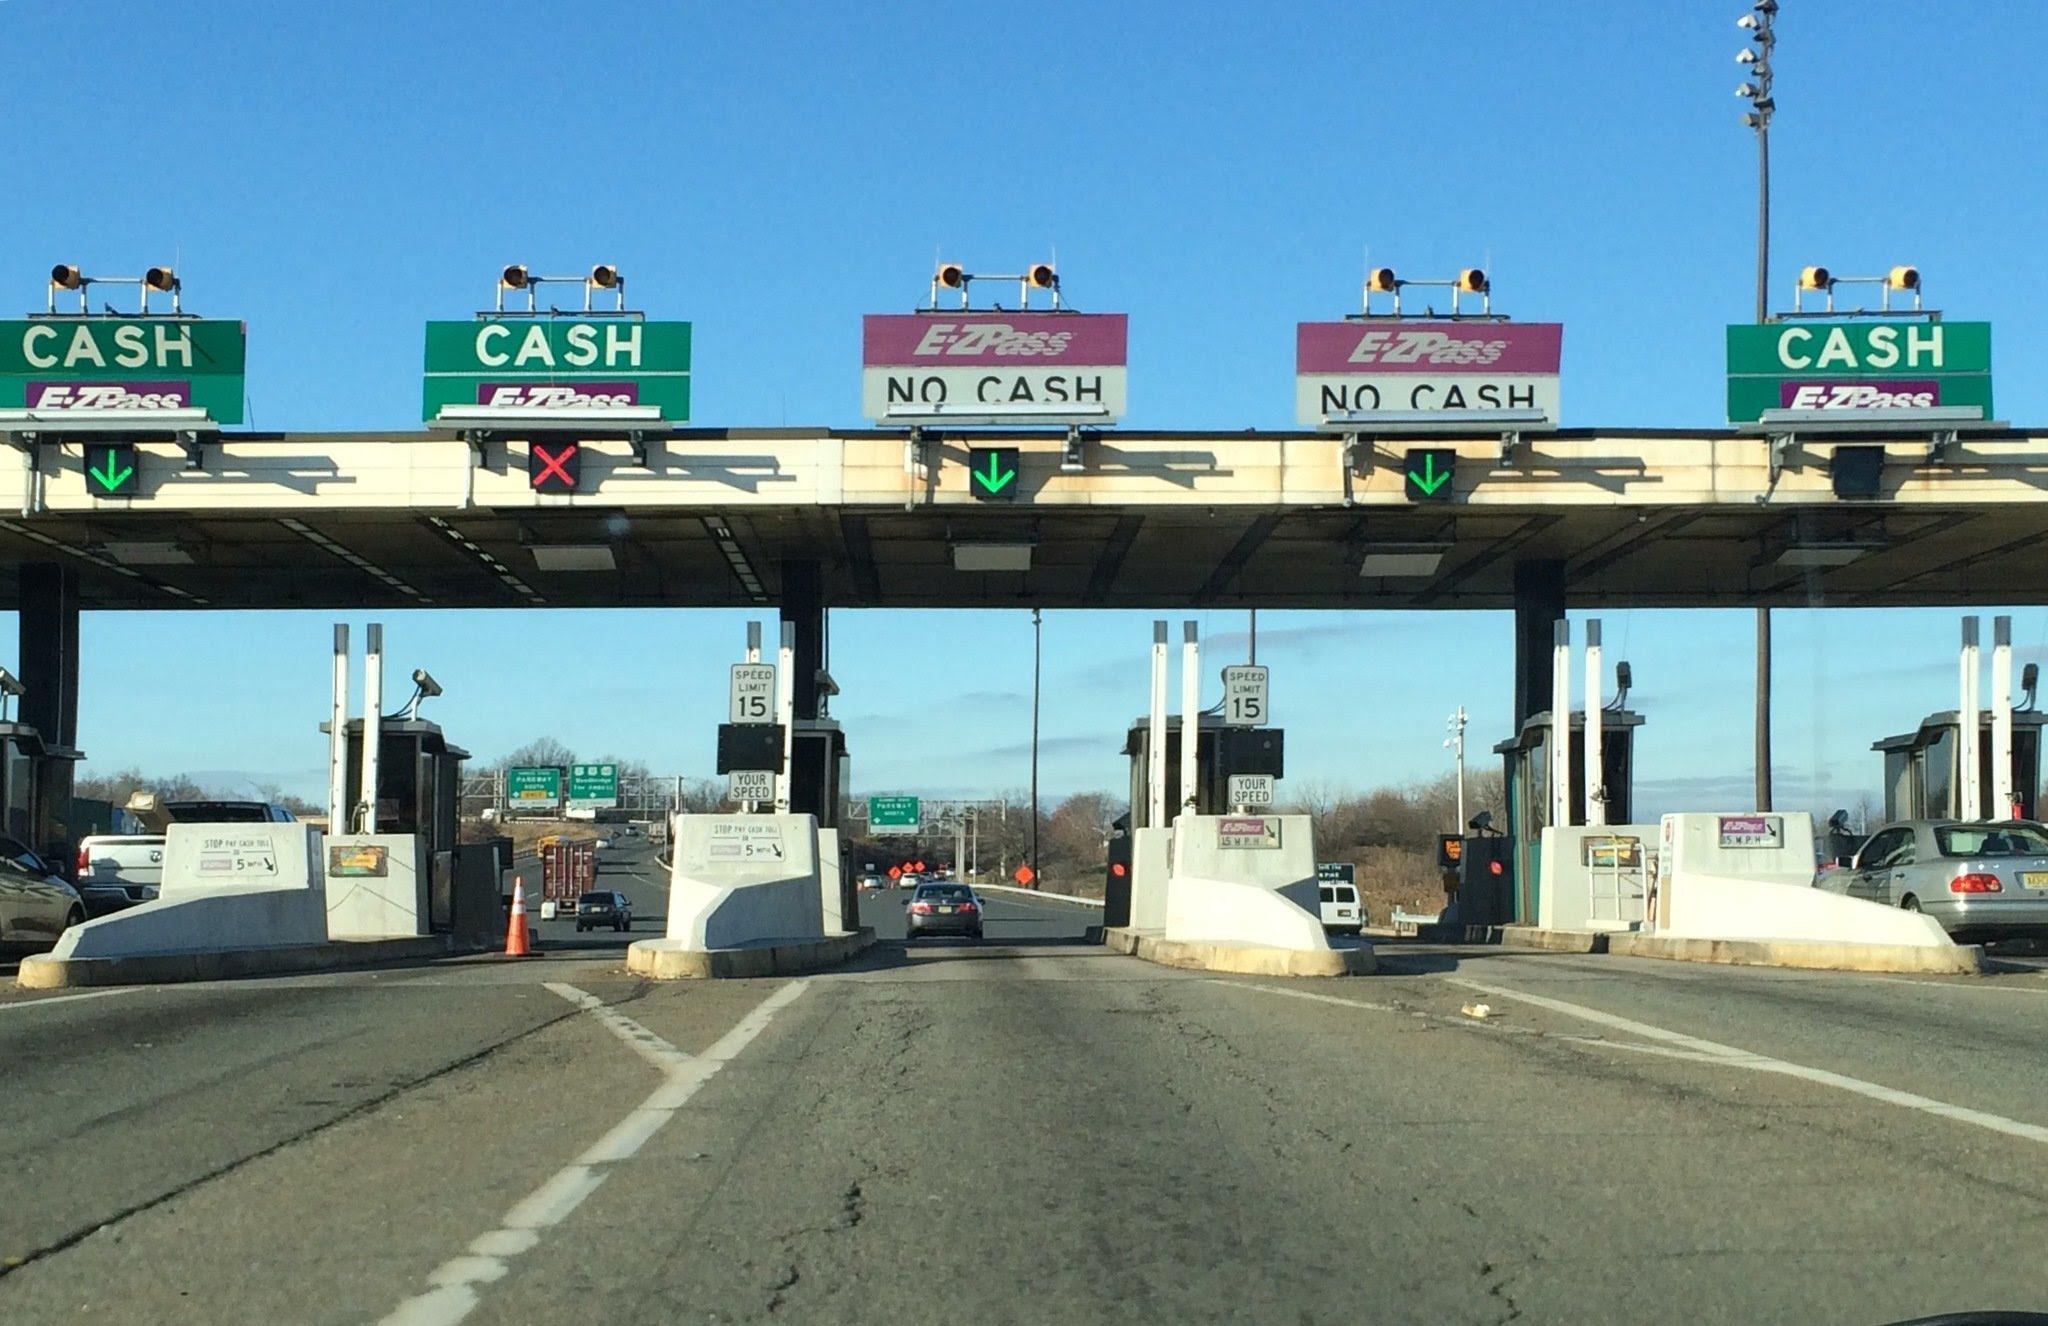 turnpike toll plaza at exit 11 jpeg 9b6b9a3239abe095